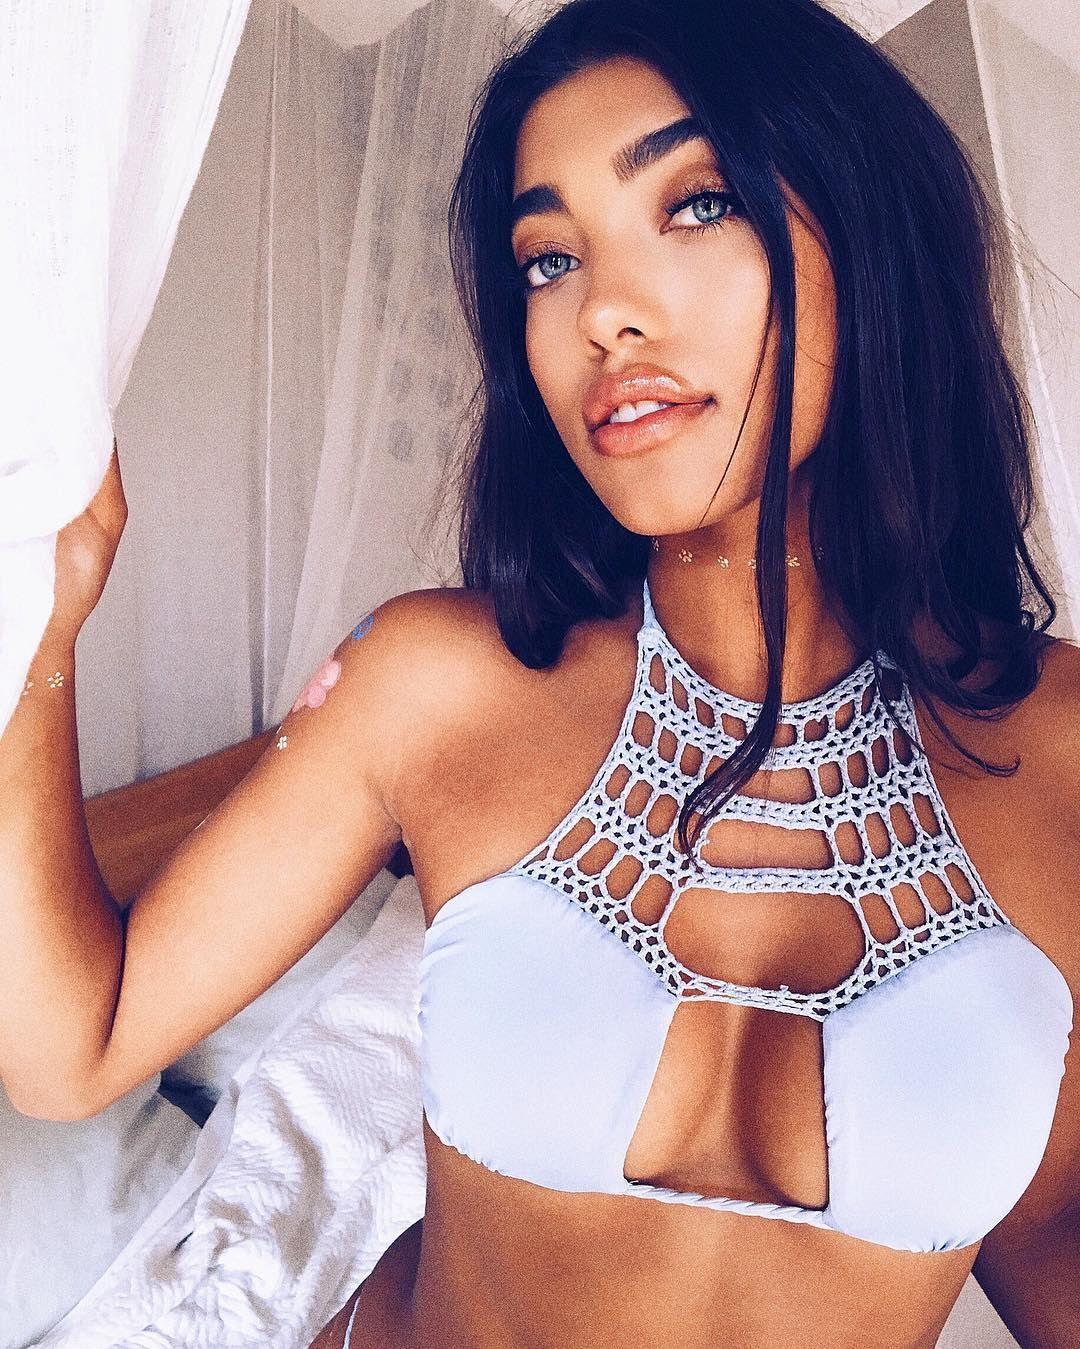 Beach videos bikini — img 1